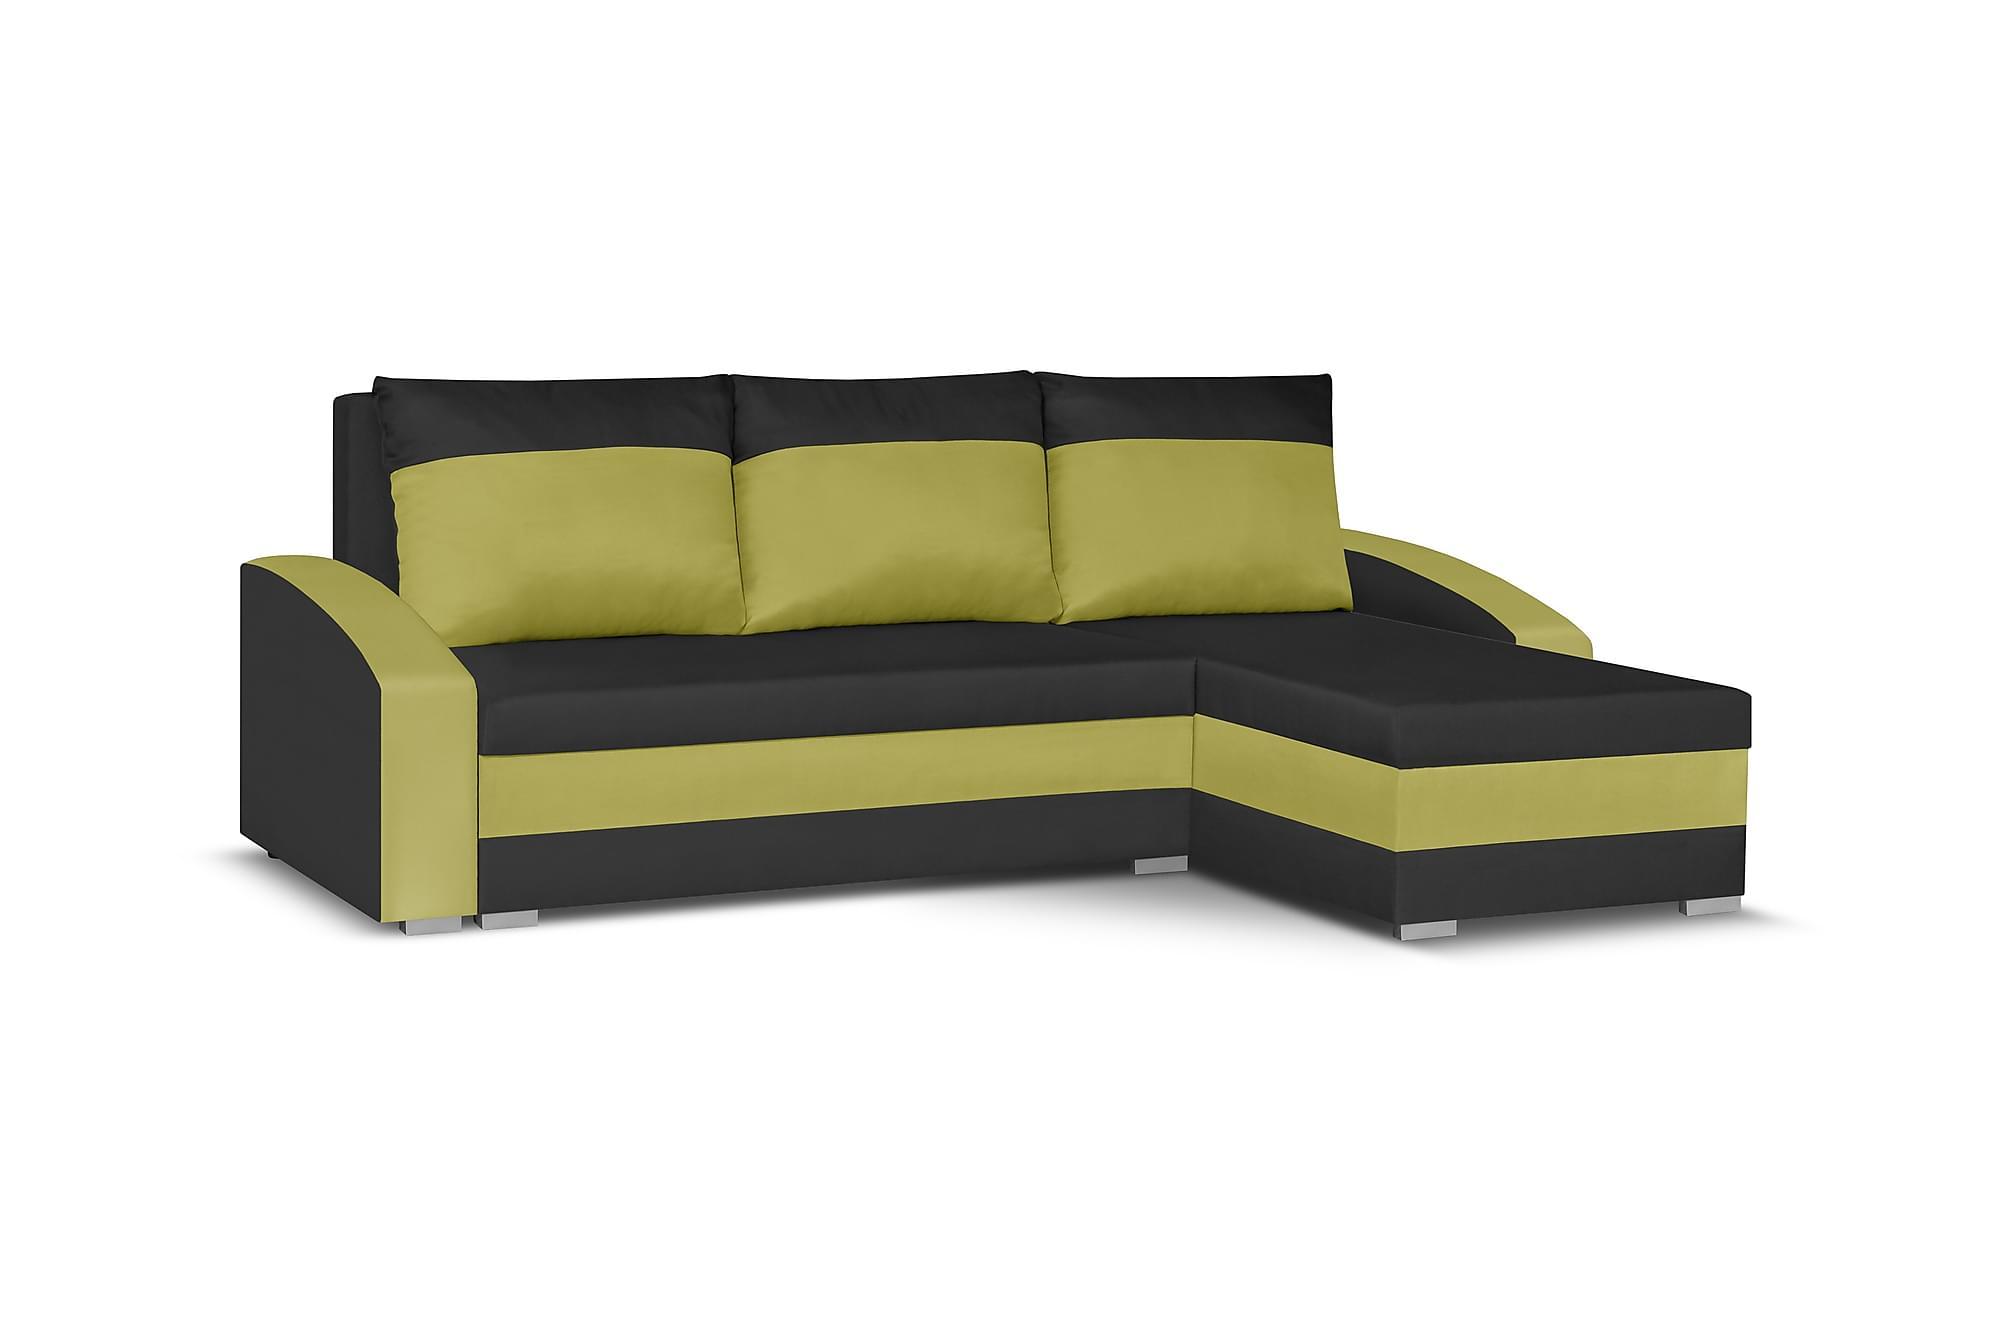 Banyoles divanbäddsoffa svart/grön